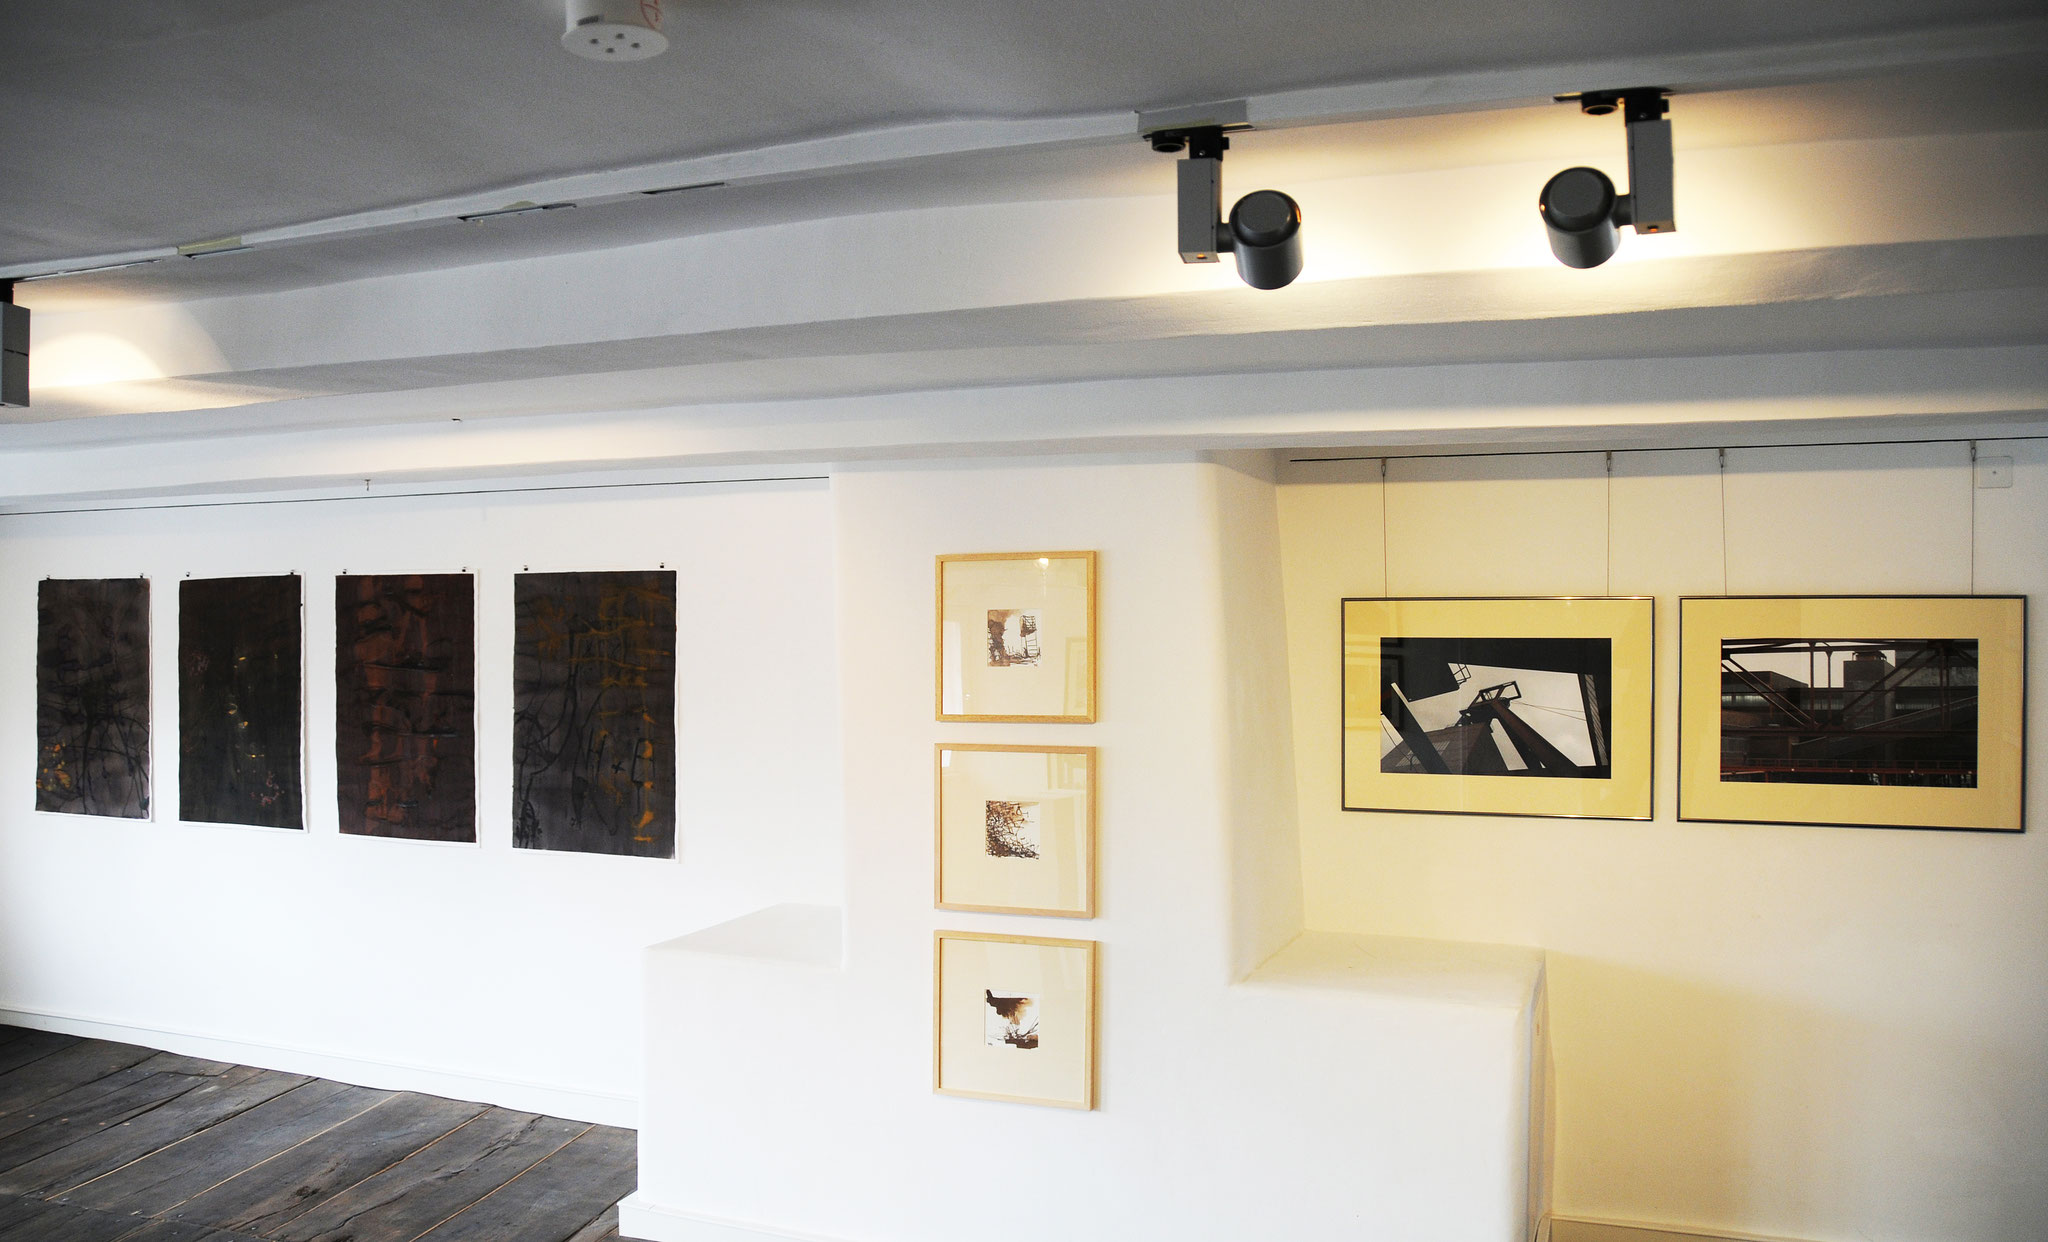 """ZWIESPRACHE - Michaela Berning-Tournier und Wolfgang Blockus"", Kunstverein Gütersloh, 5.3. -9.4.2017"